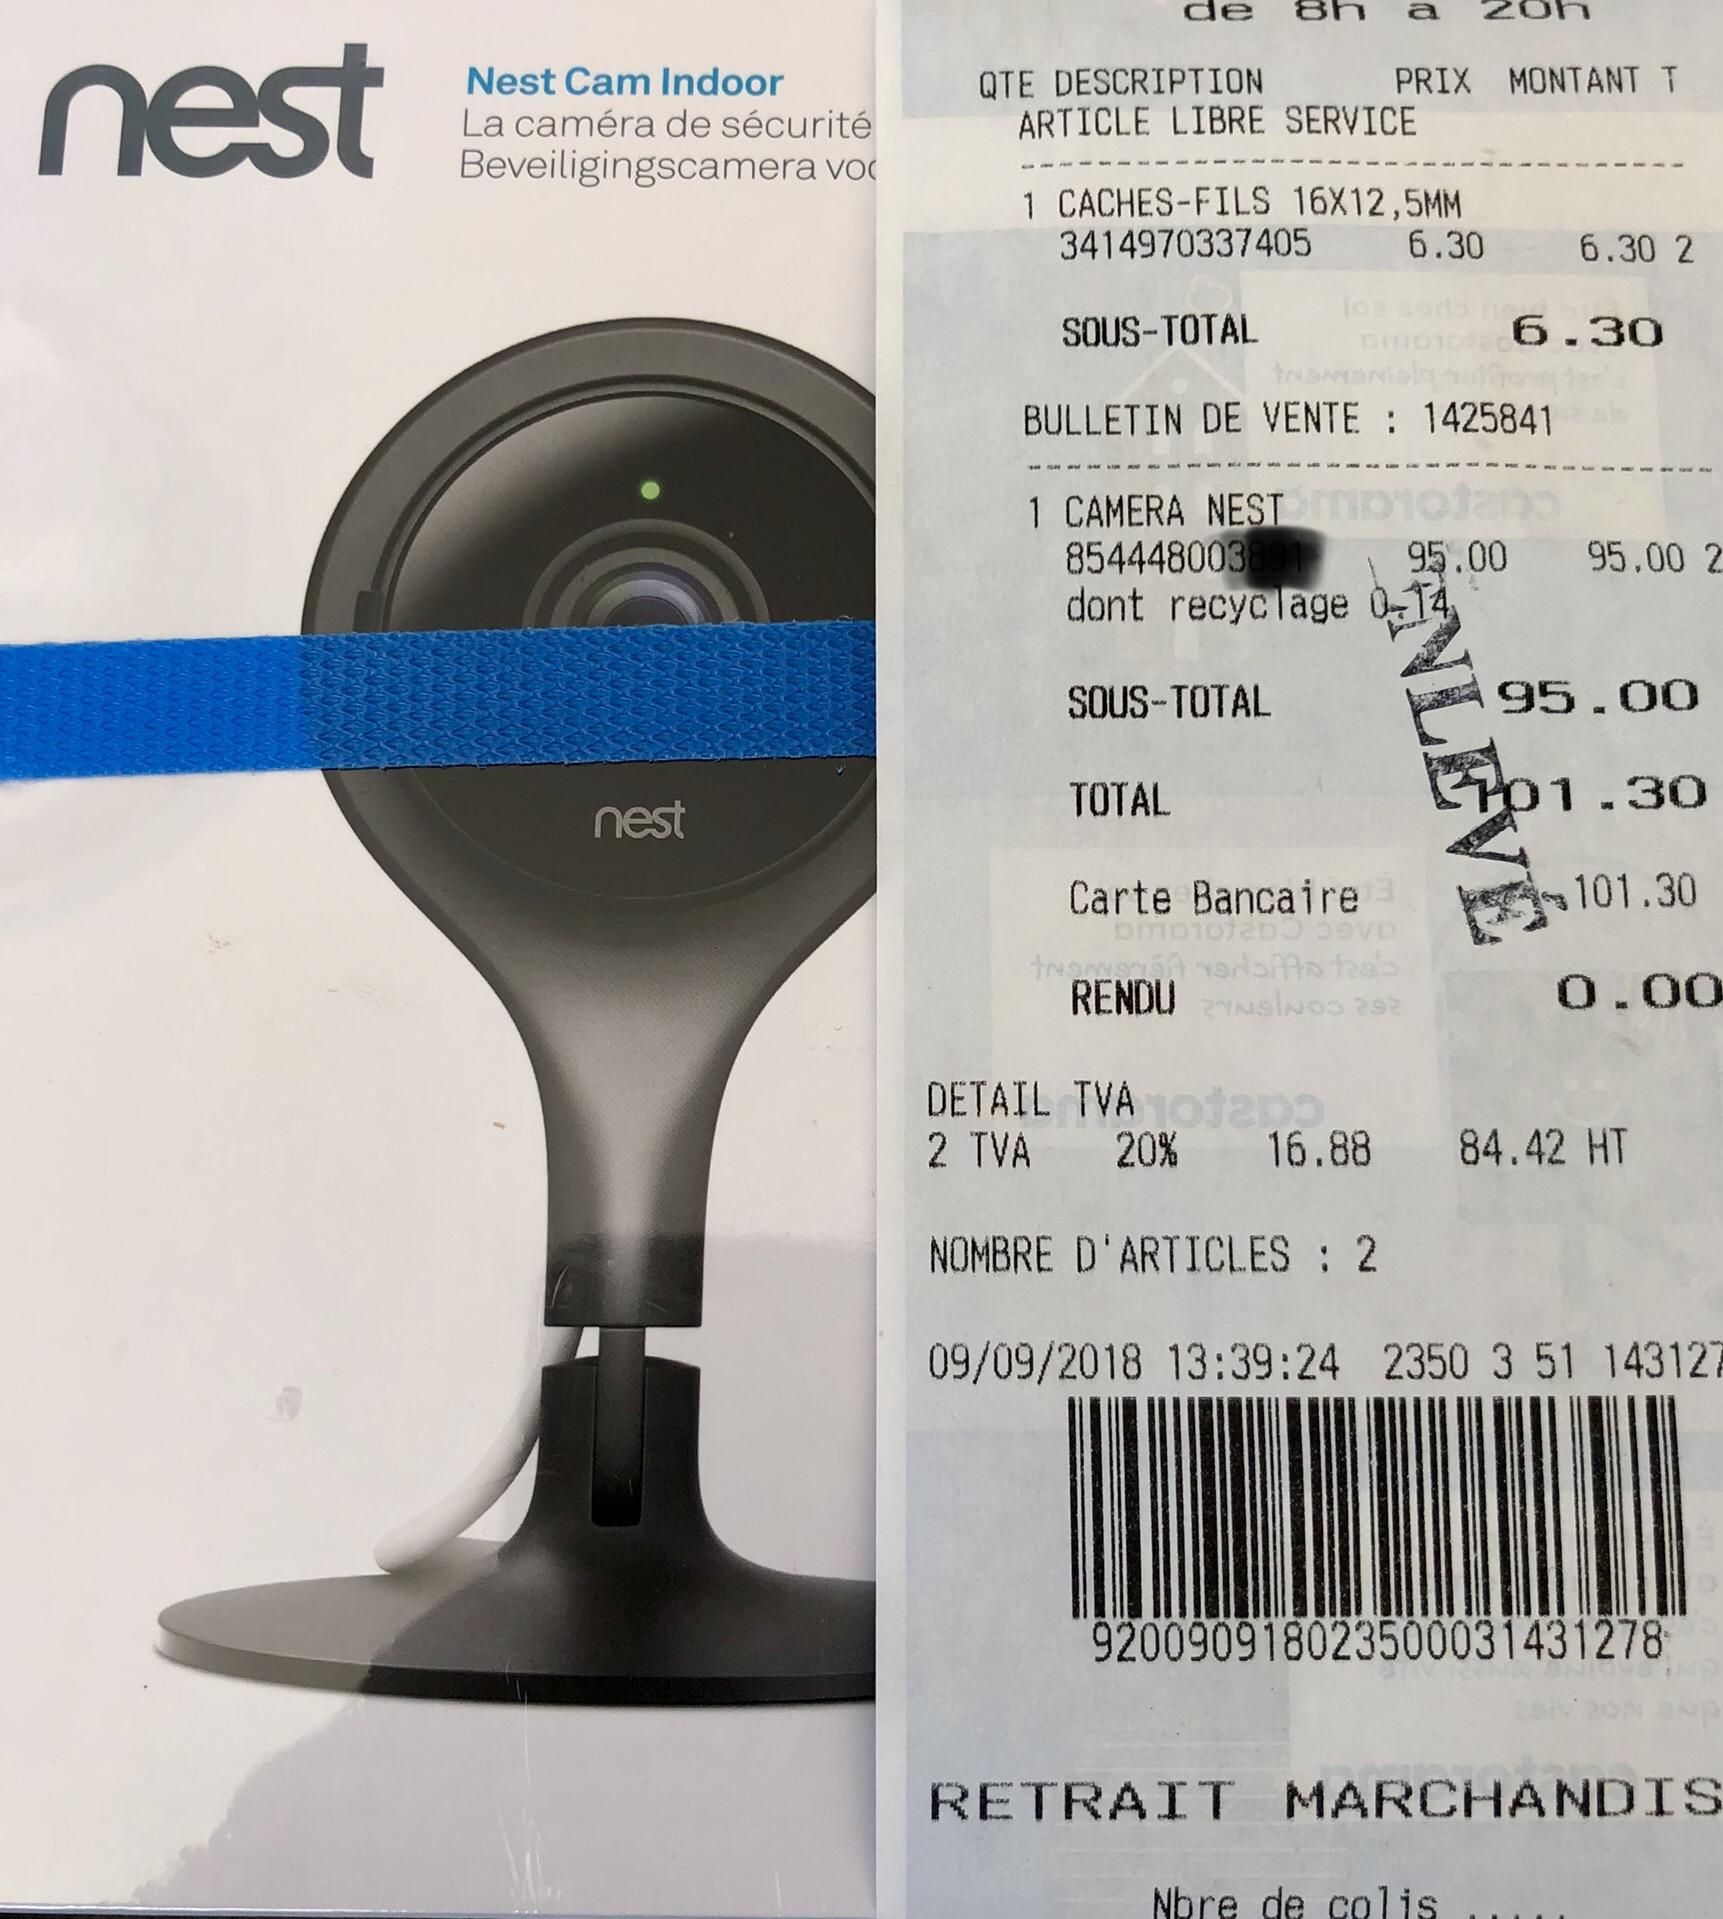 camera nest indoor castorama cormeilles en parisis 95. Black Bedroom Furniture Sets. Home Design Ideas